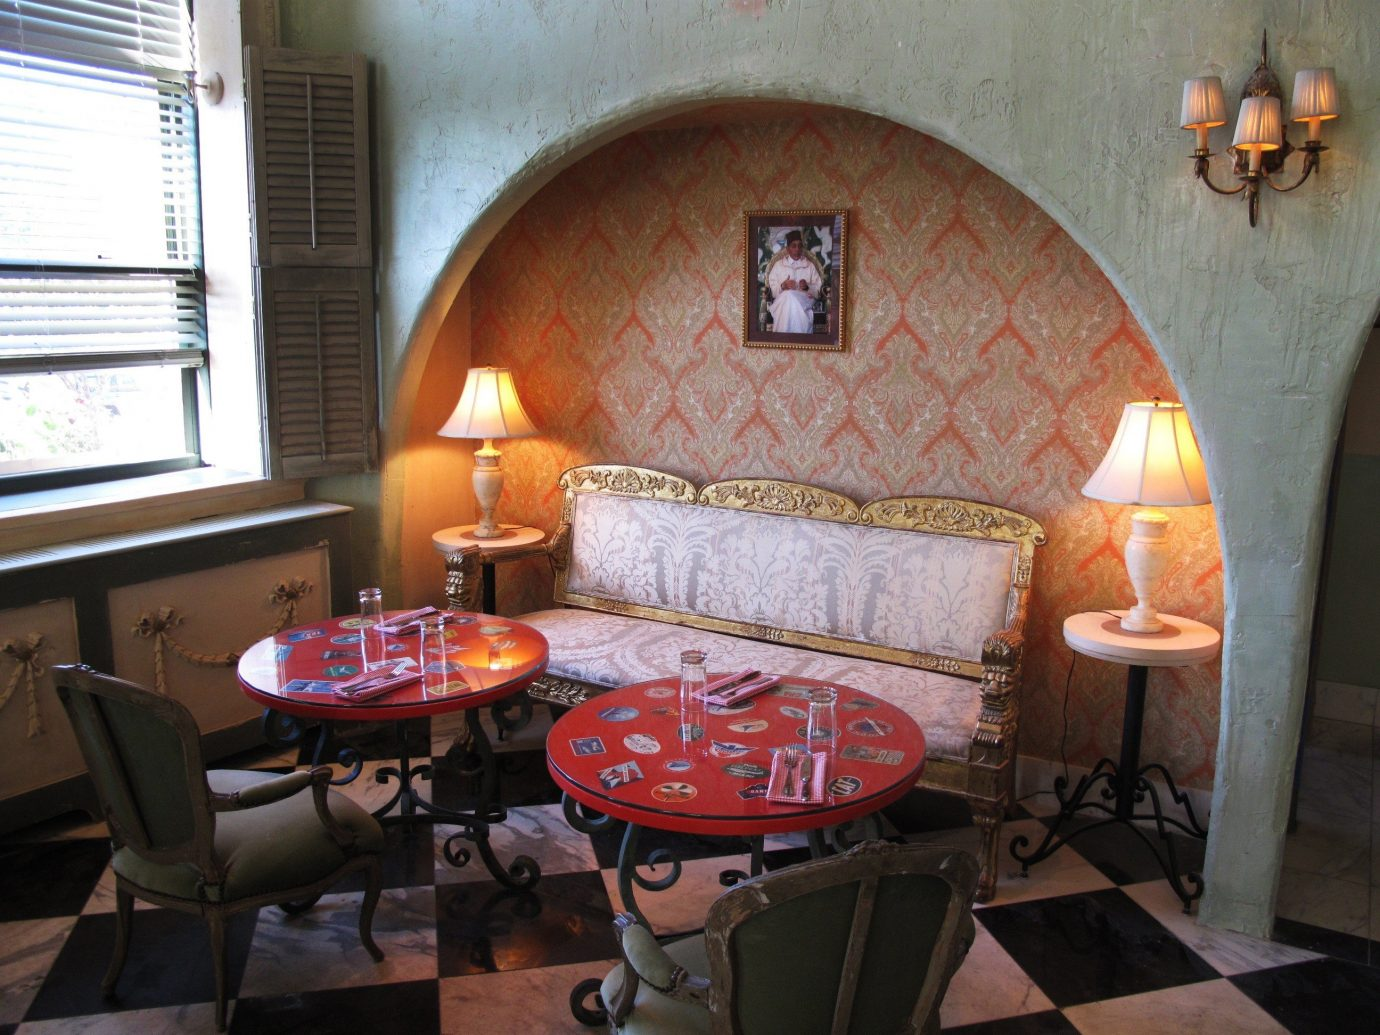 Hotels indoor property room cottage home living room restaurant interior design estate hacienda Villa